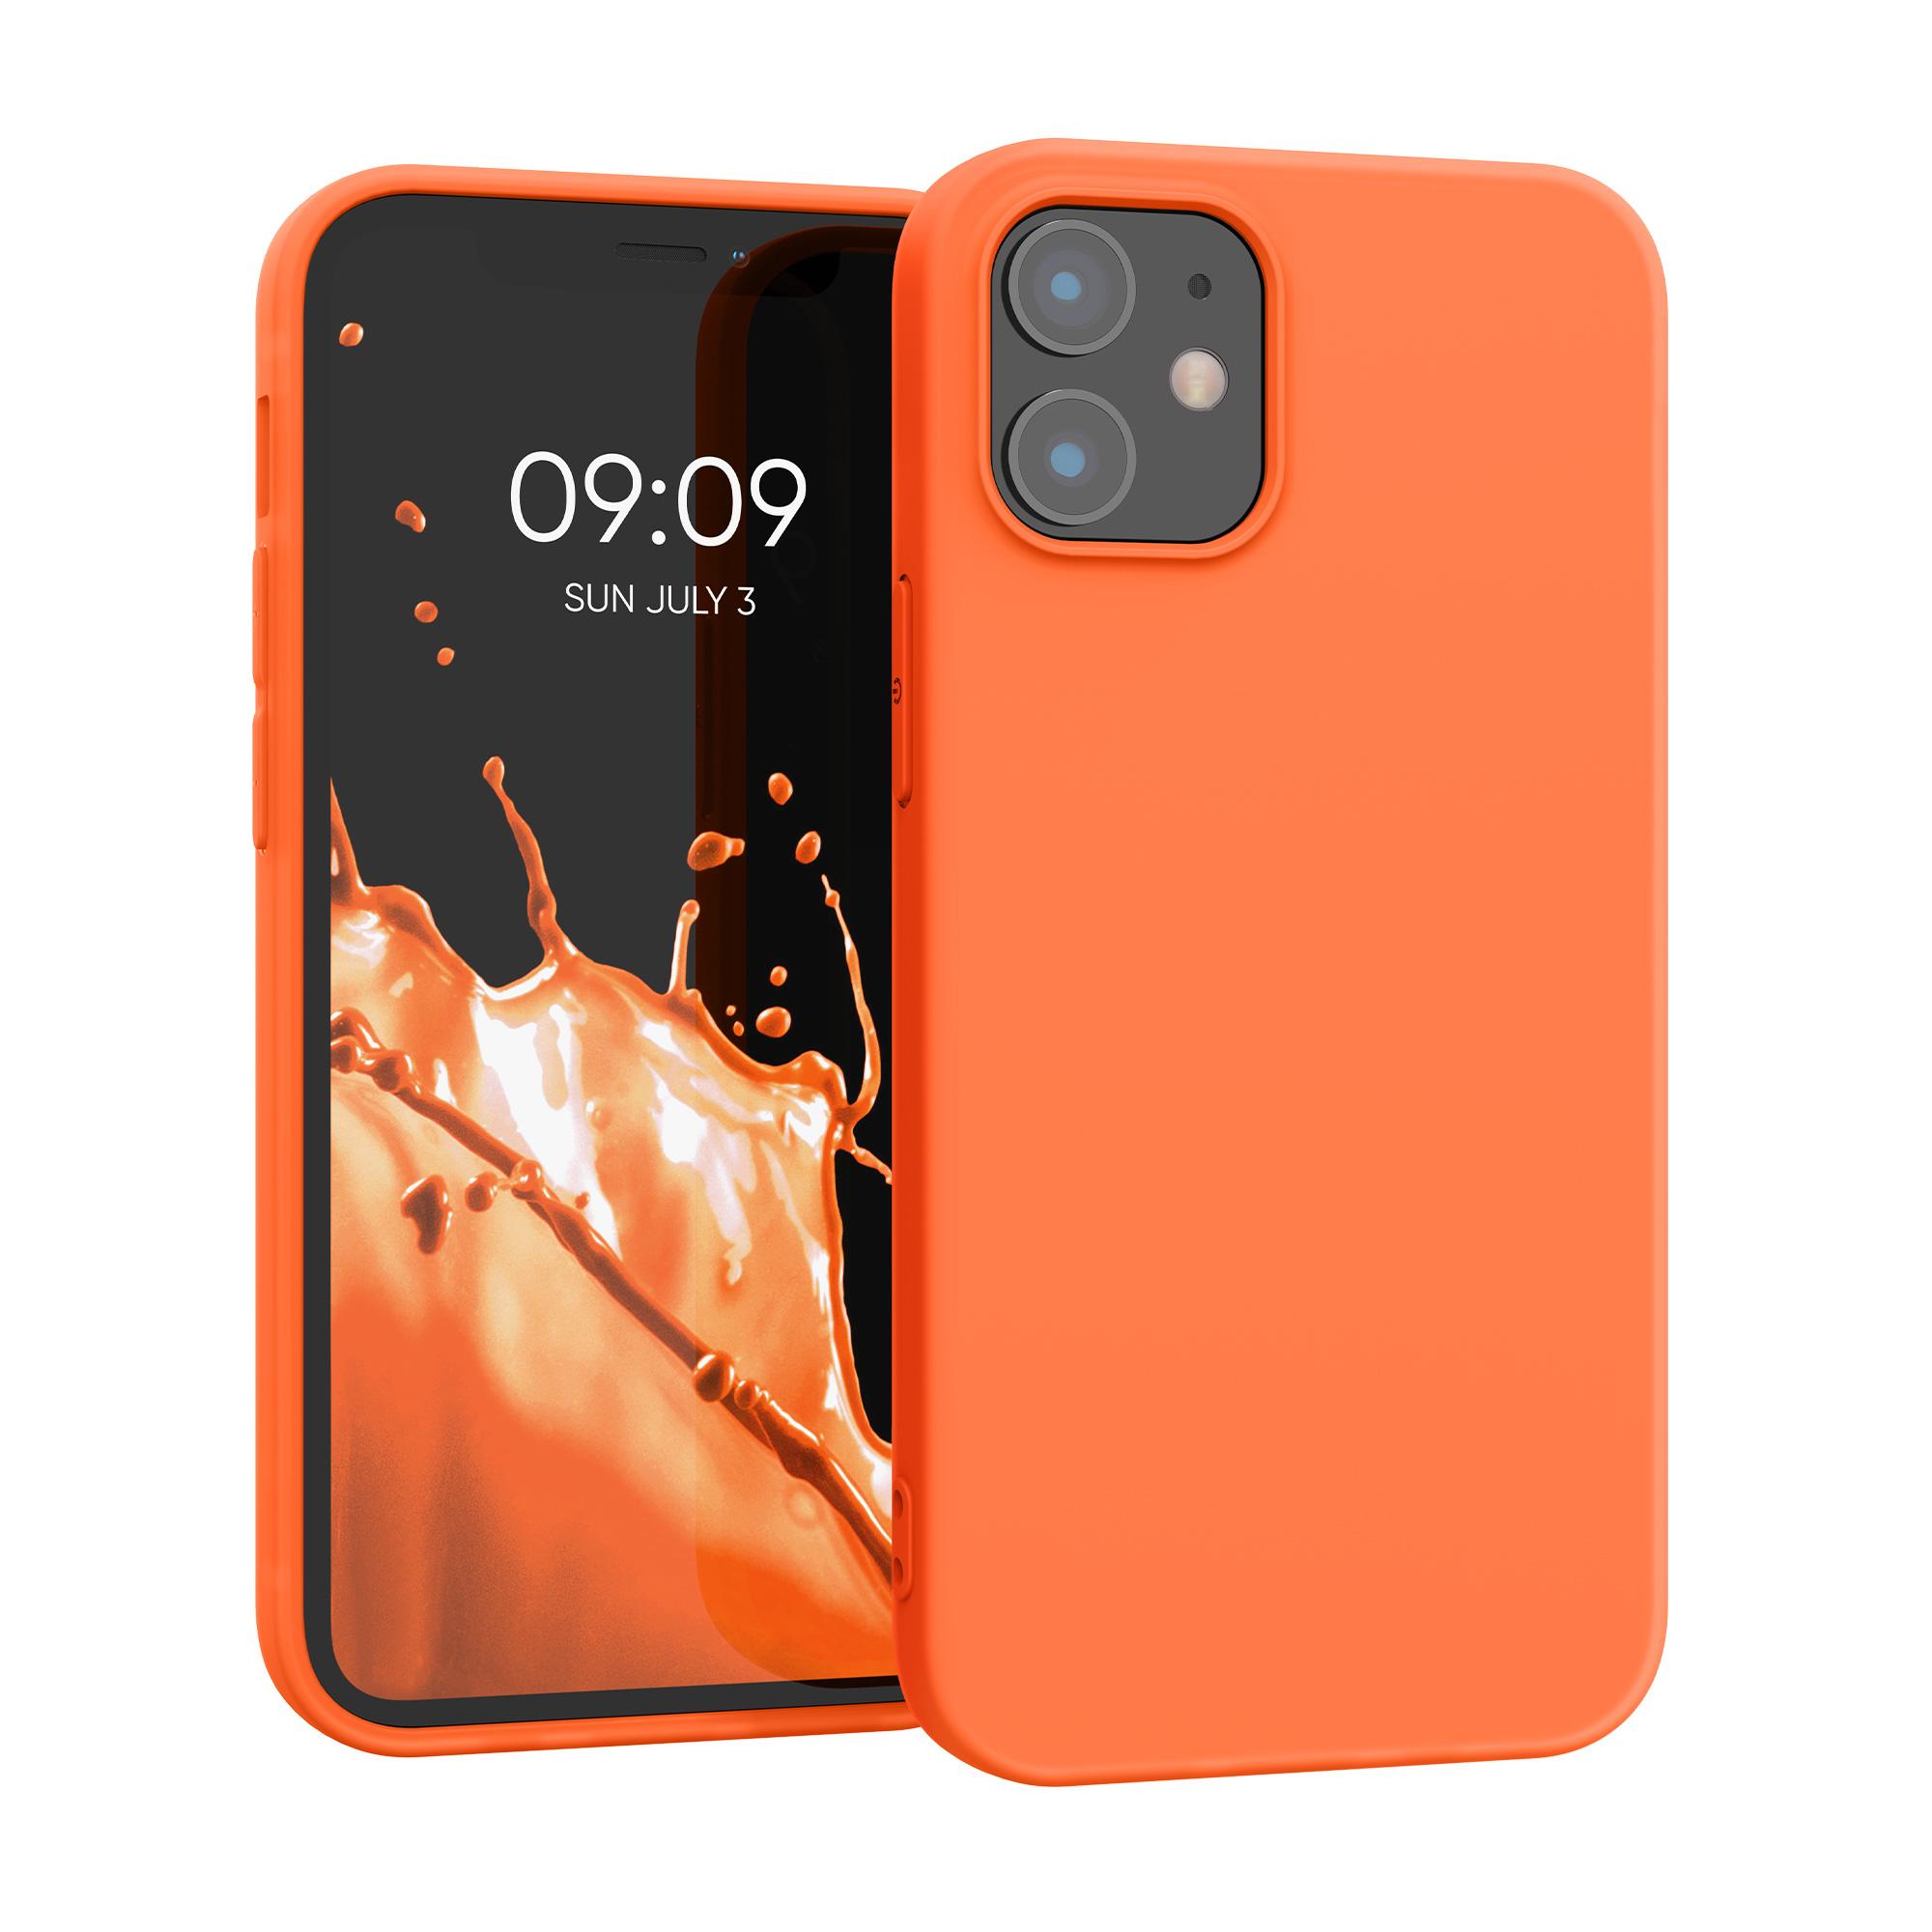 Kvalitní silikonové TPU pouzdro pro Apple iPhone 12 mini - Neon Orange